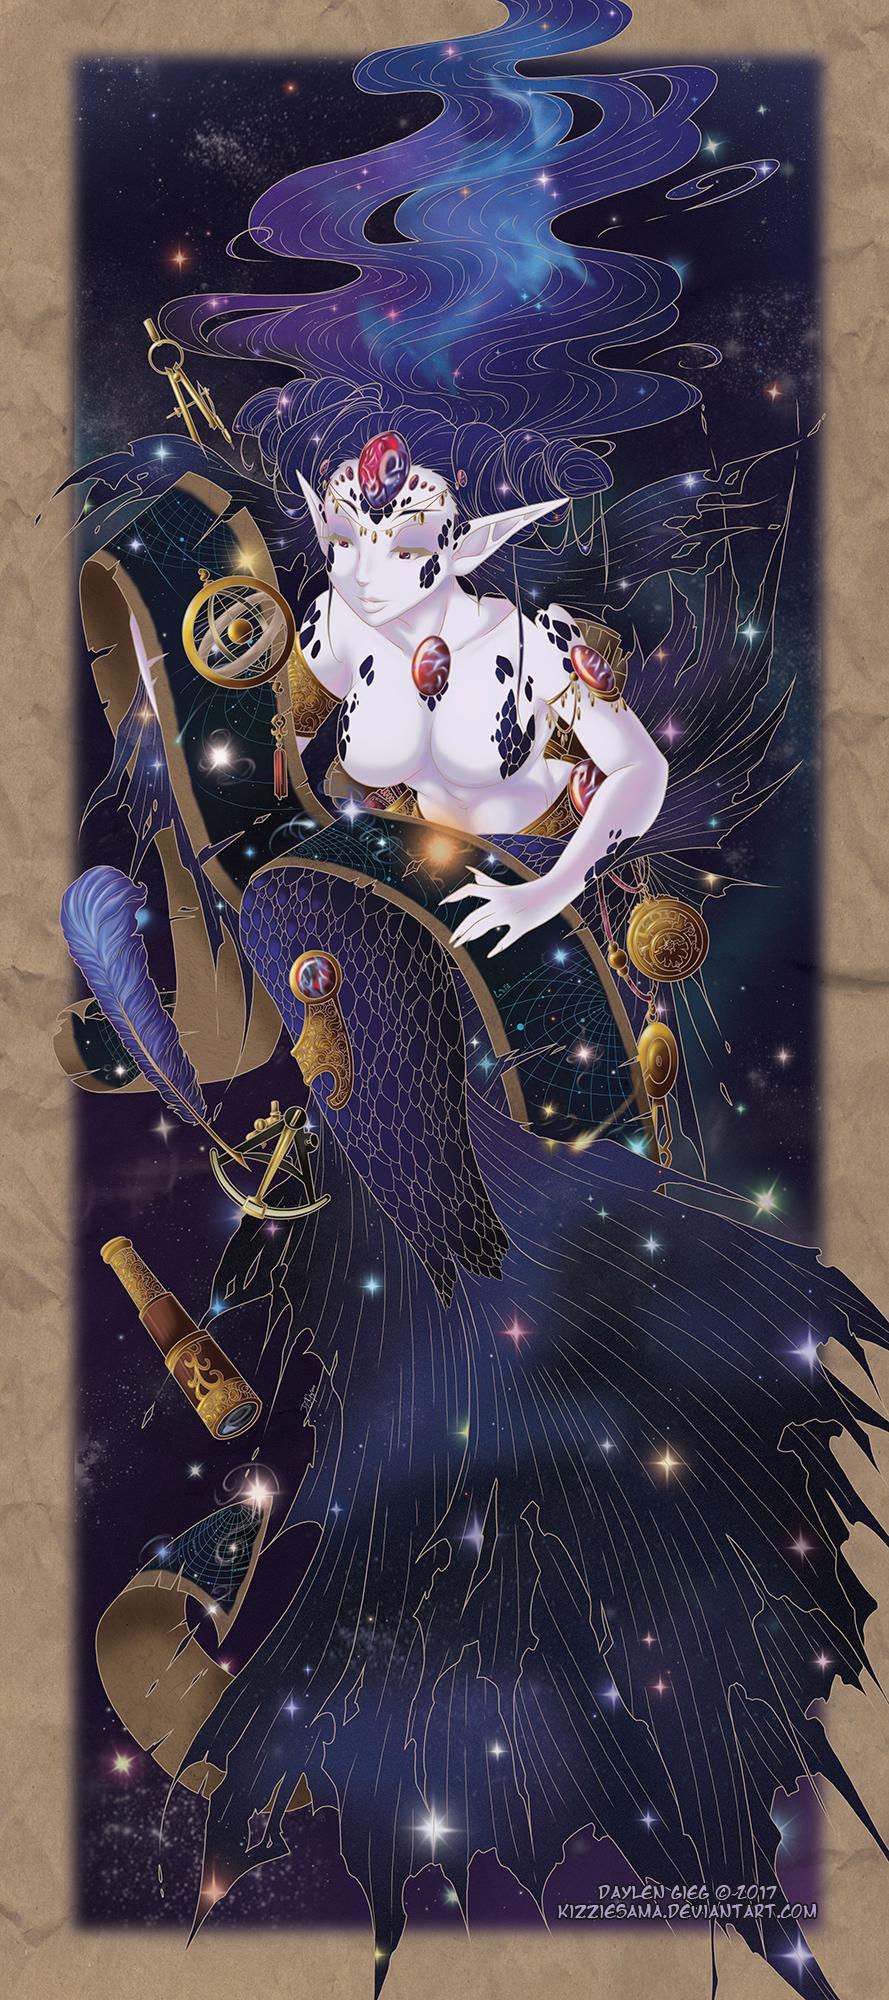 Cartographer of the Celestial Sea